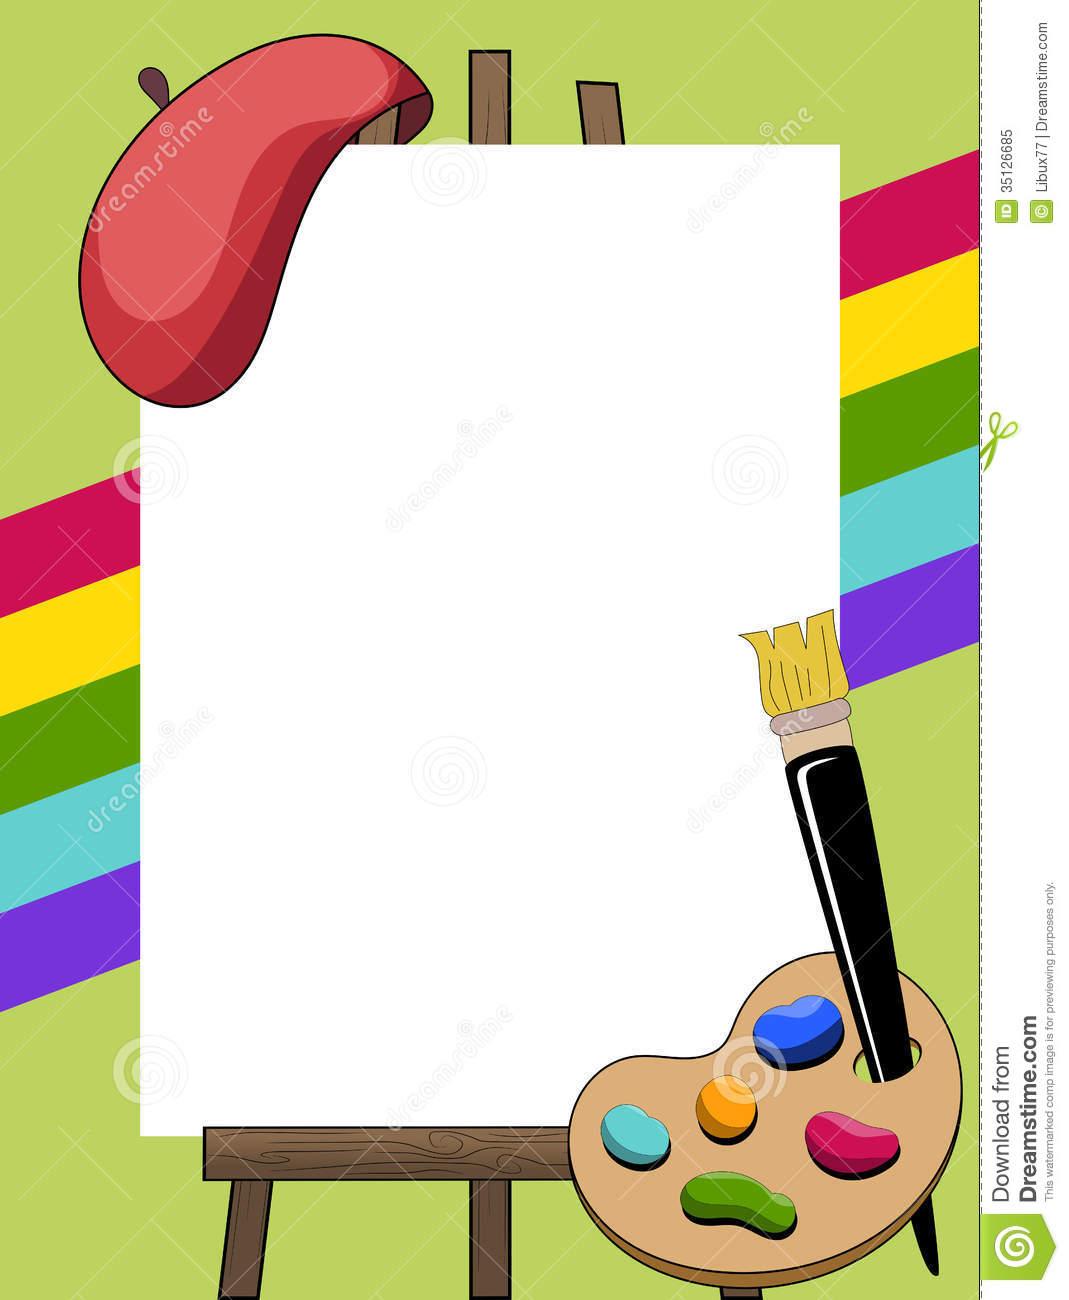 Paint Easel Clipart - Clipart Kid